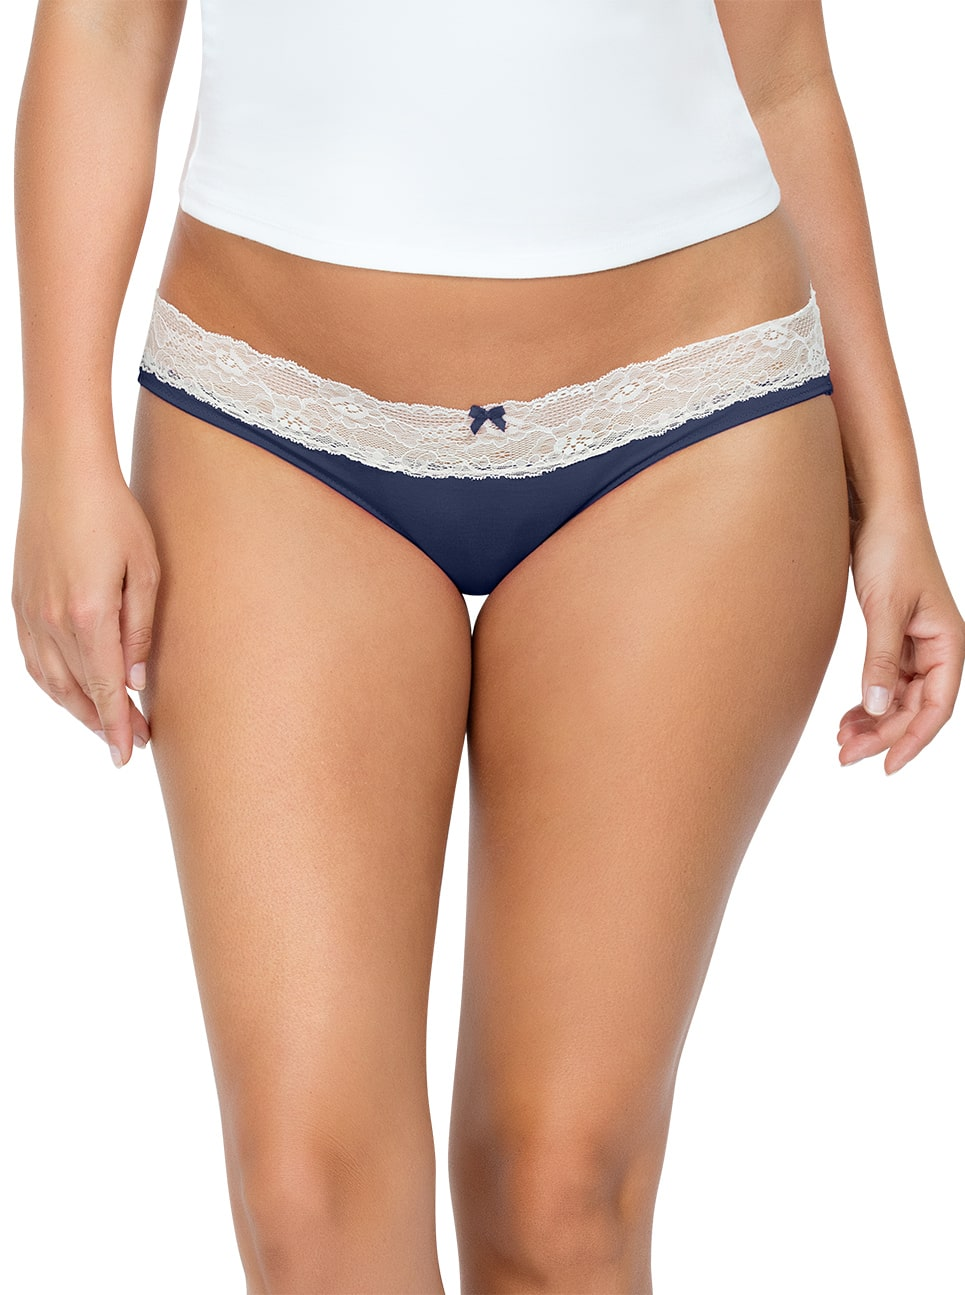 PARFAIT ParfaitPanty SoEssential BikiniPP303 NavyBlue Front close - Panty So Essential Bikini- Navy - PP303